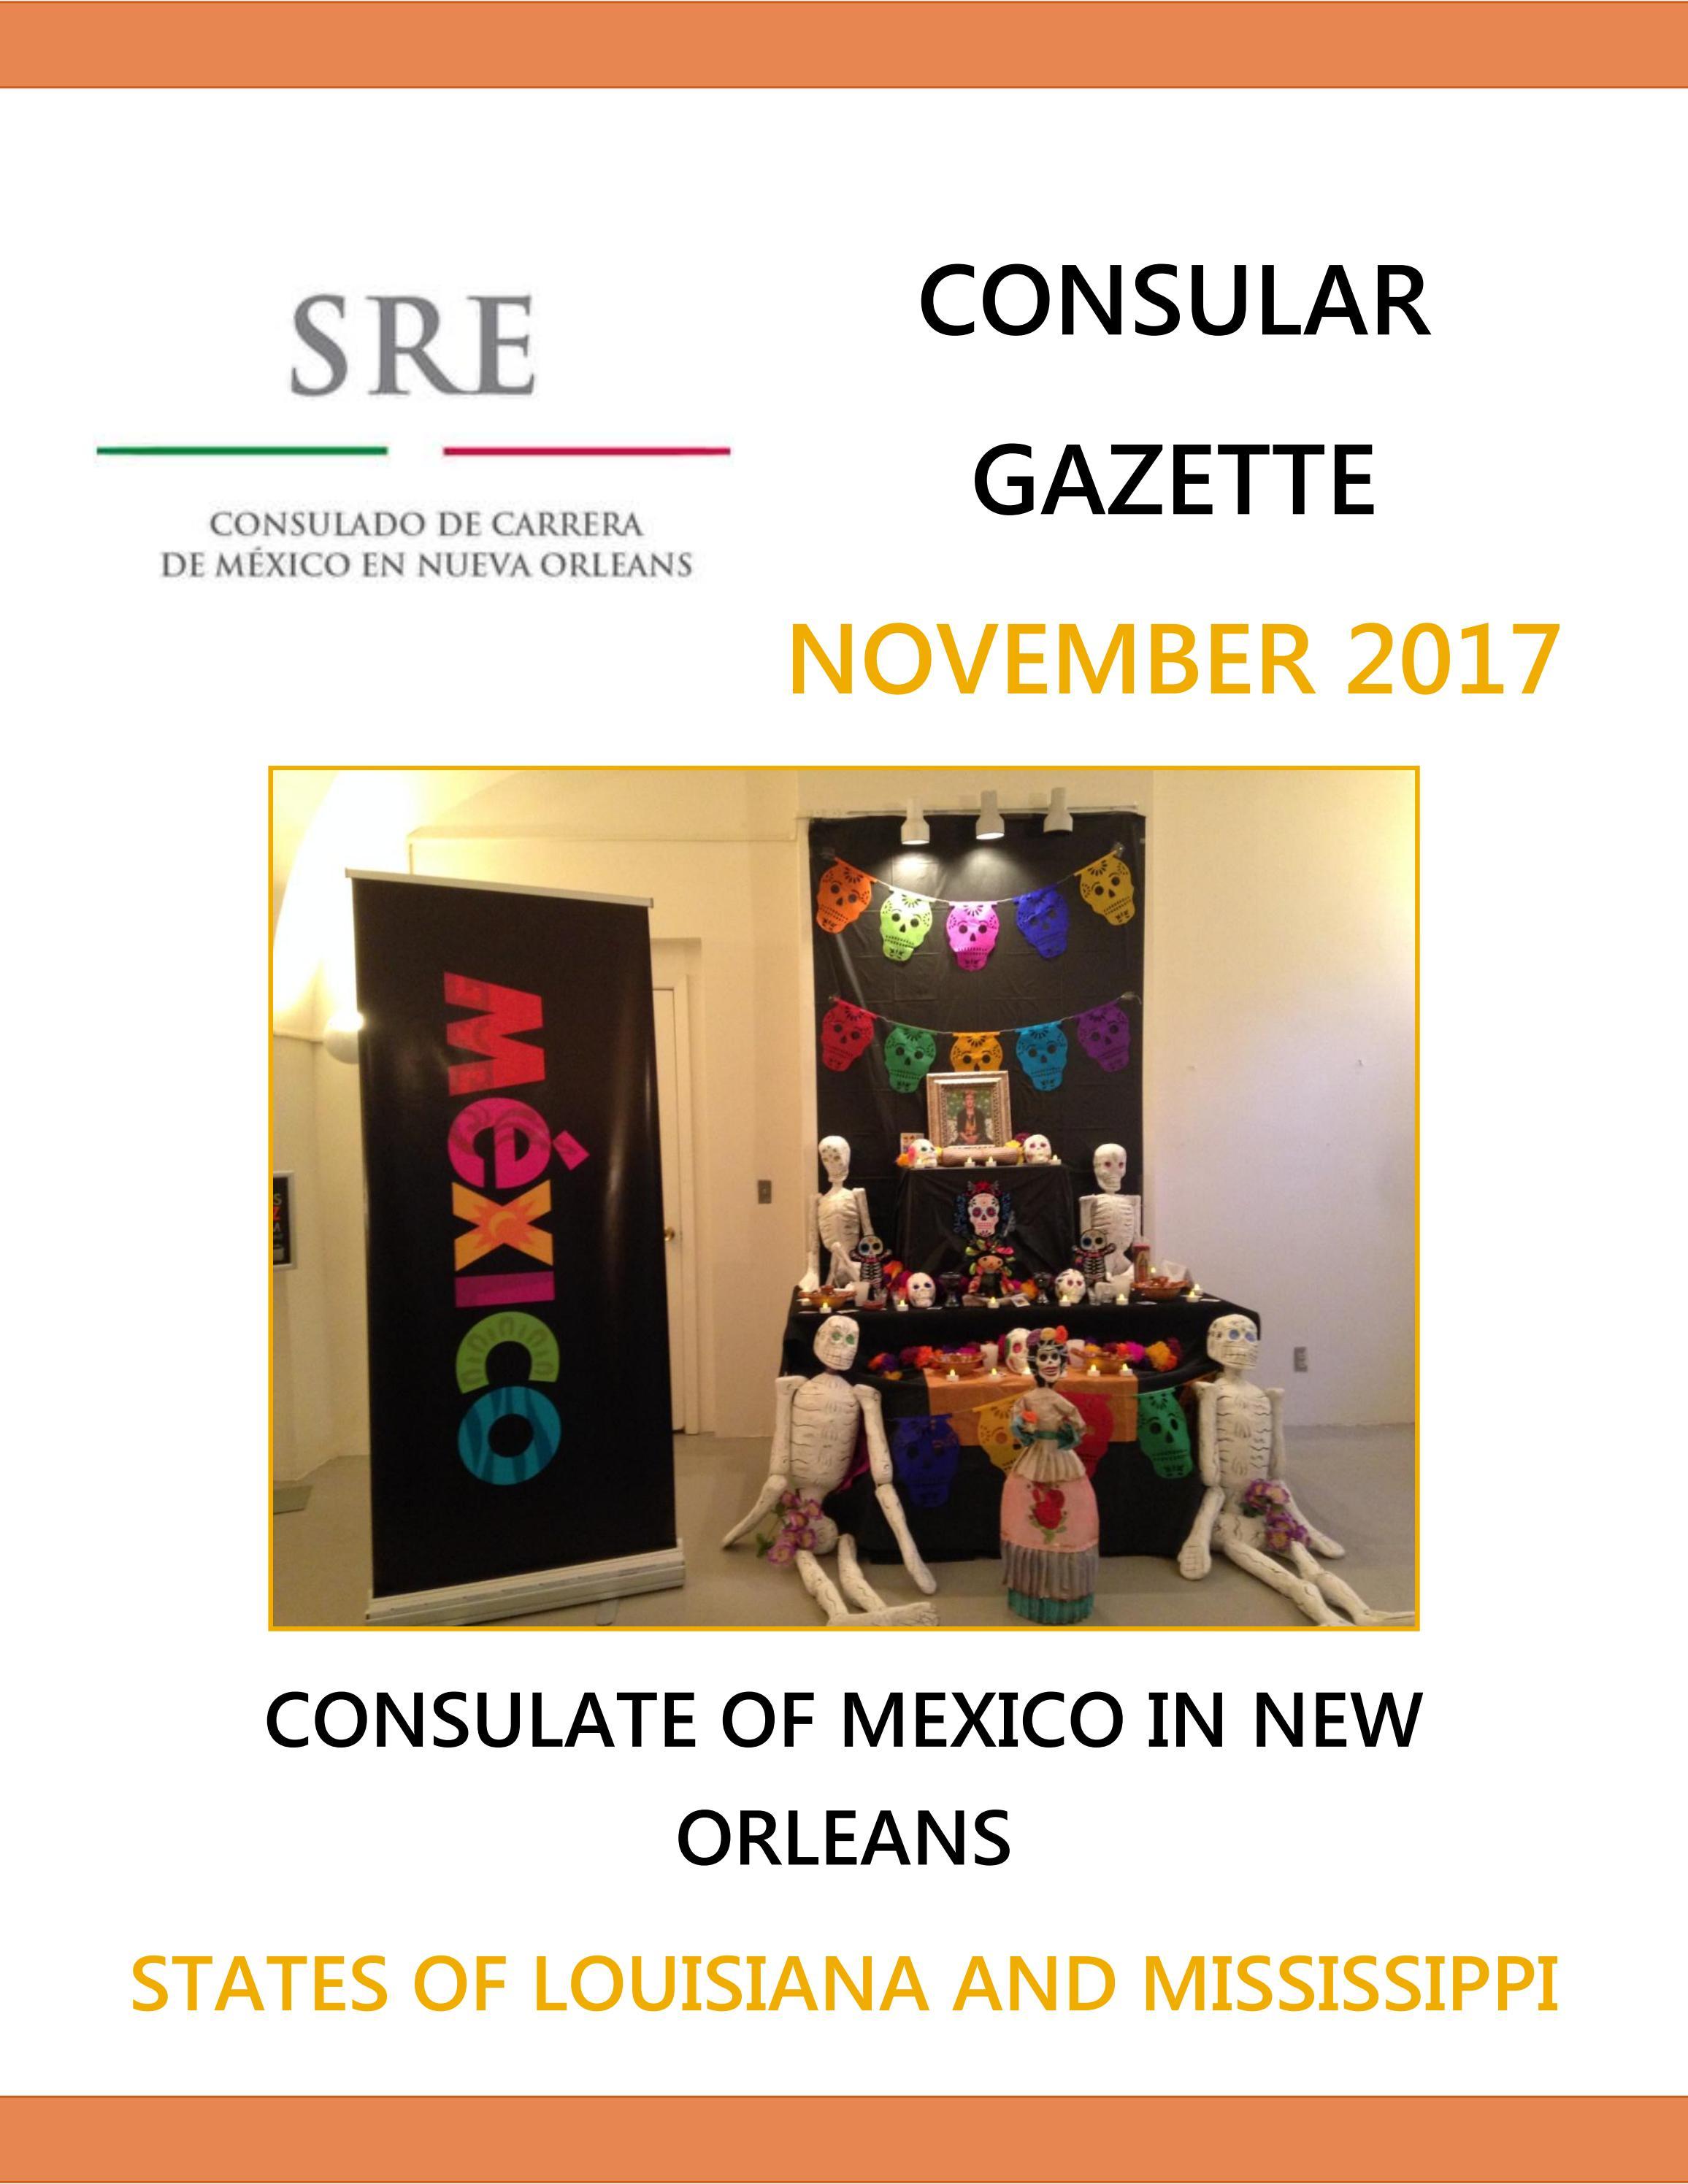 Consular Gazette November 2017, Consulate of Mexico in New